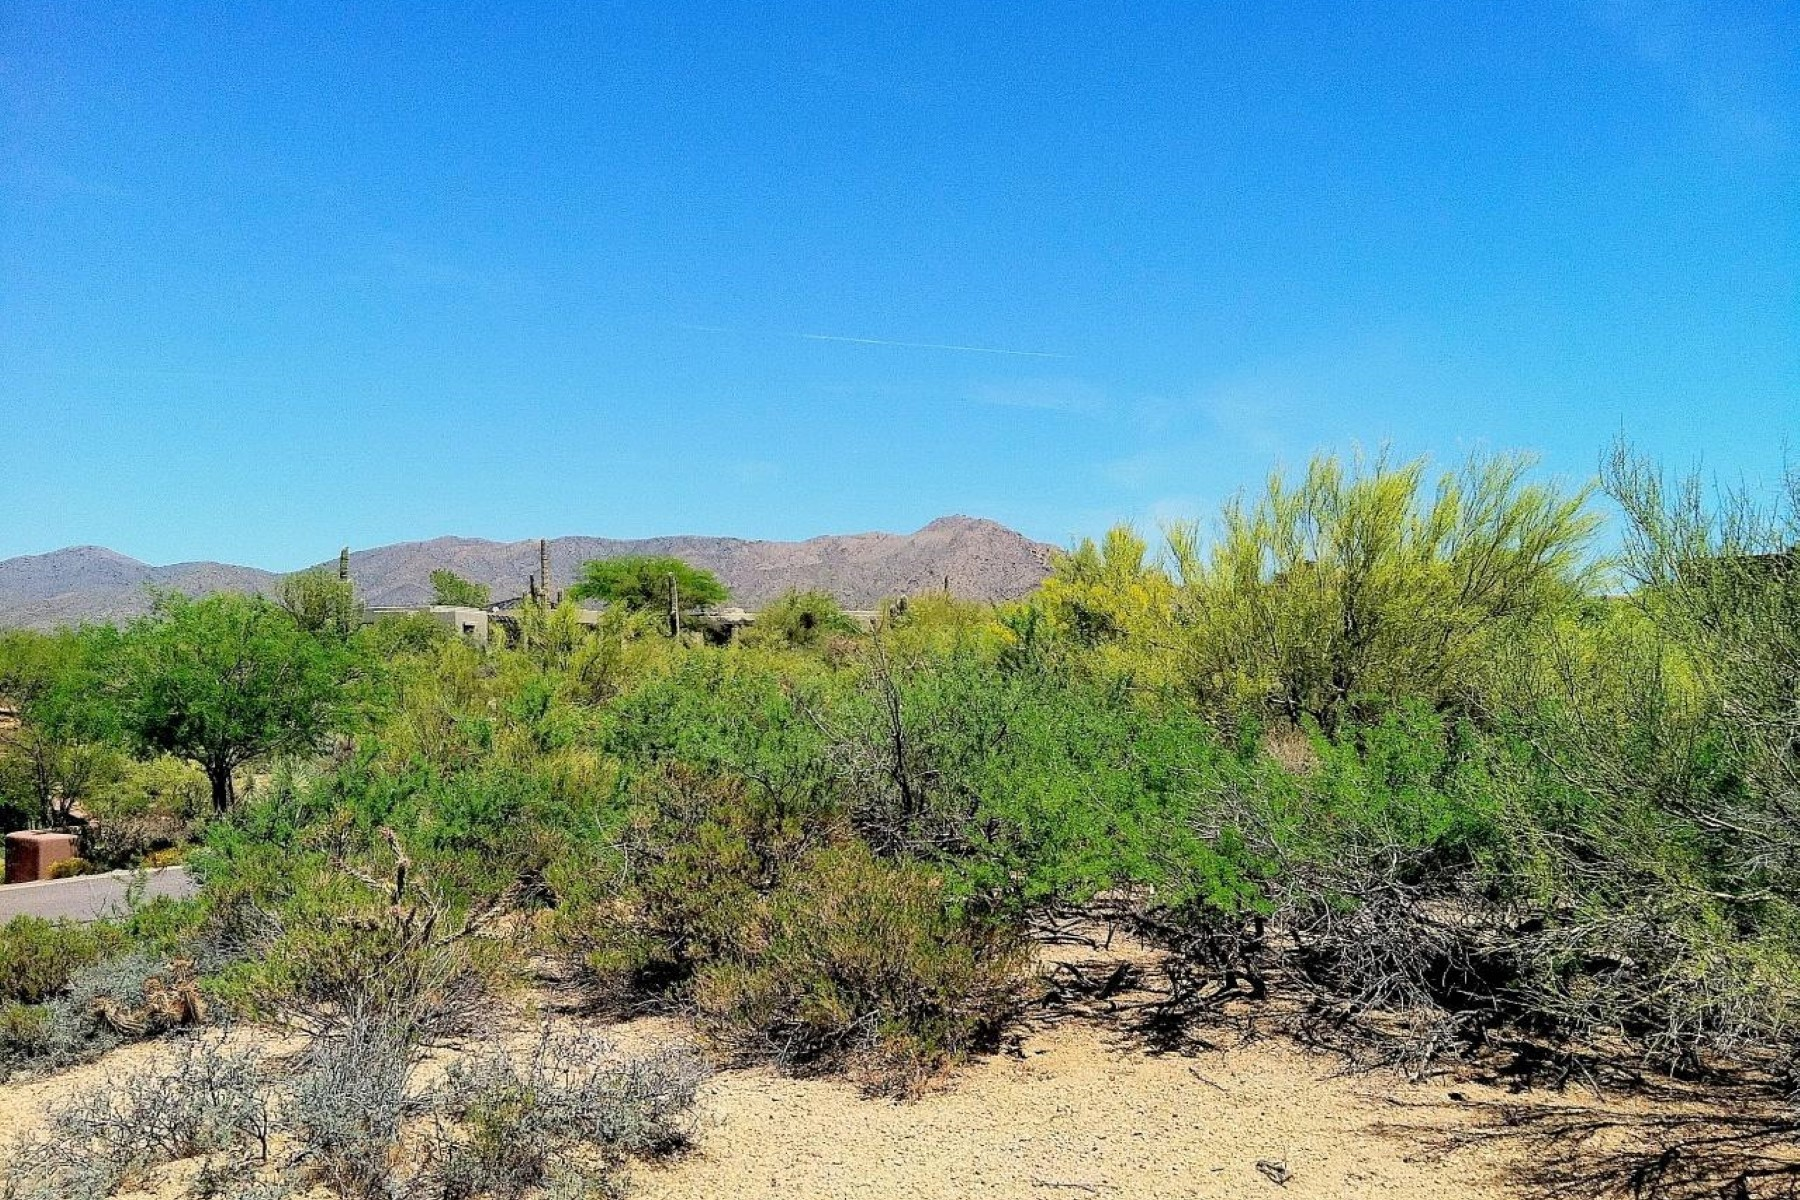 Terreno por un Venta en Southern orientation with beautiful views 10361 E Filaree Ln lot 22, Scottsdale, Arizona, 85262 Estados Unidos